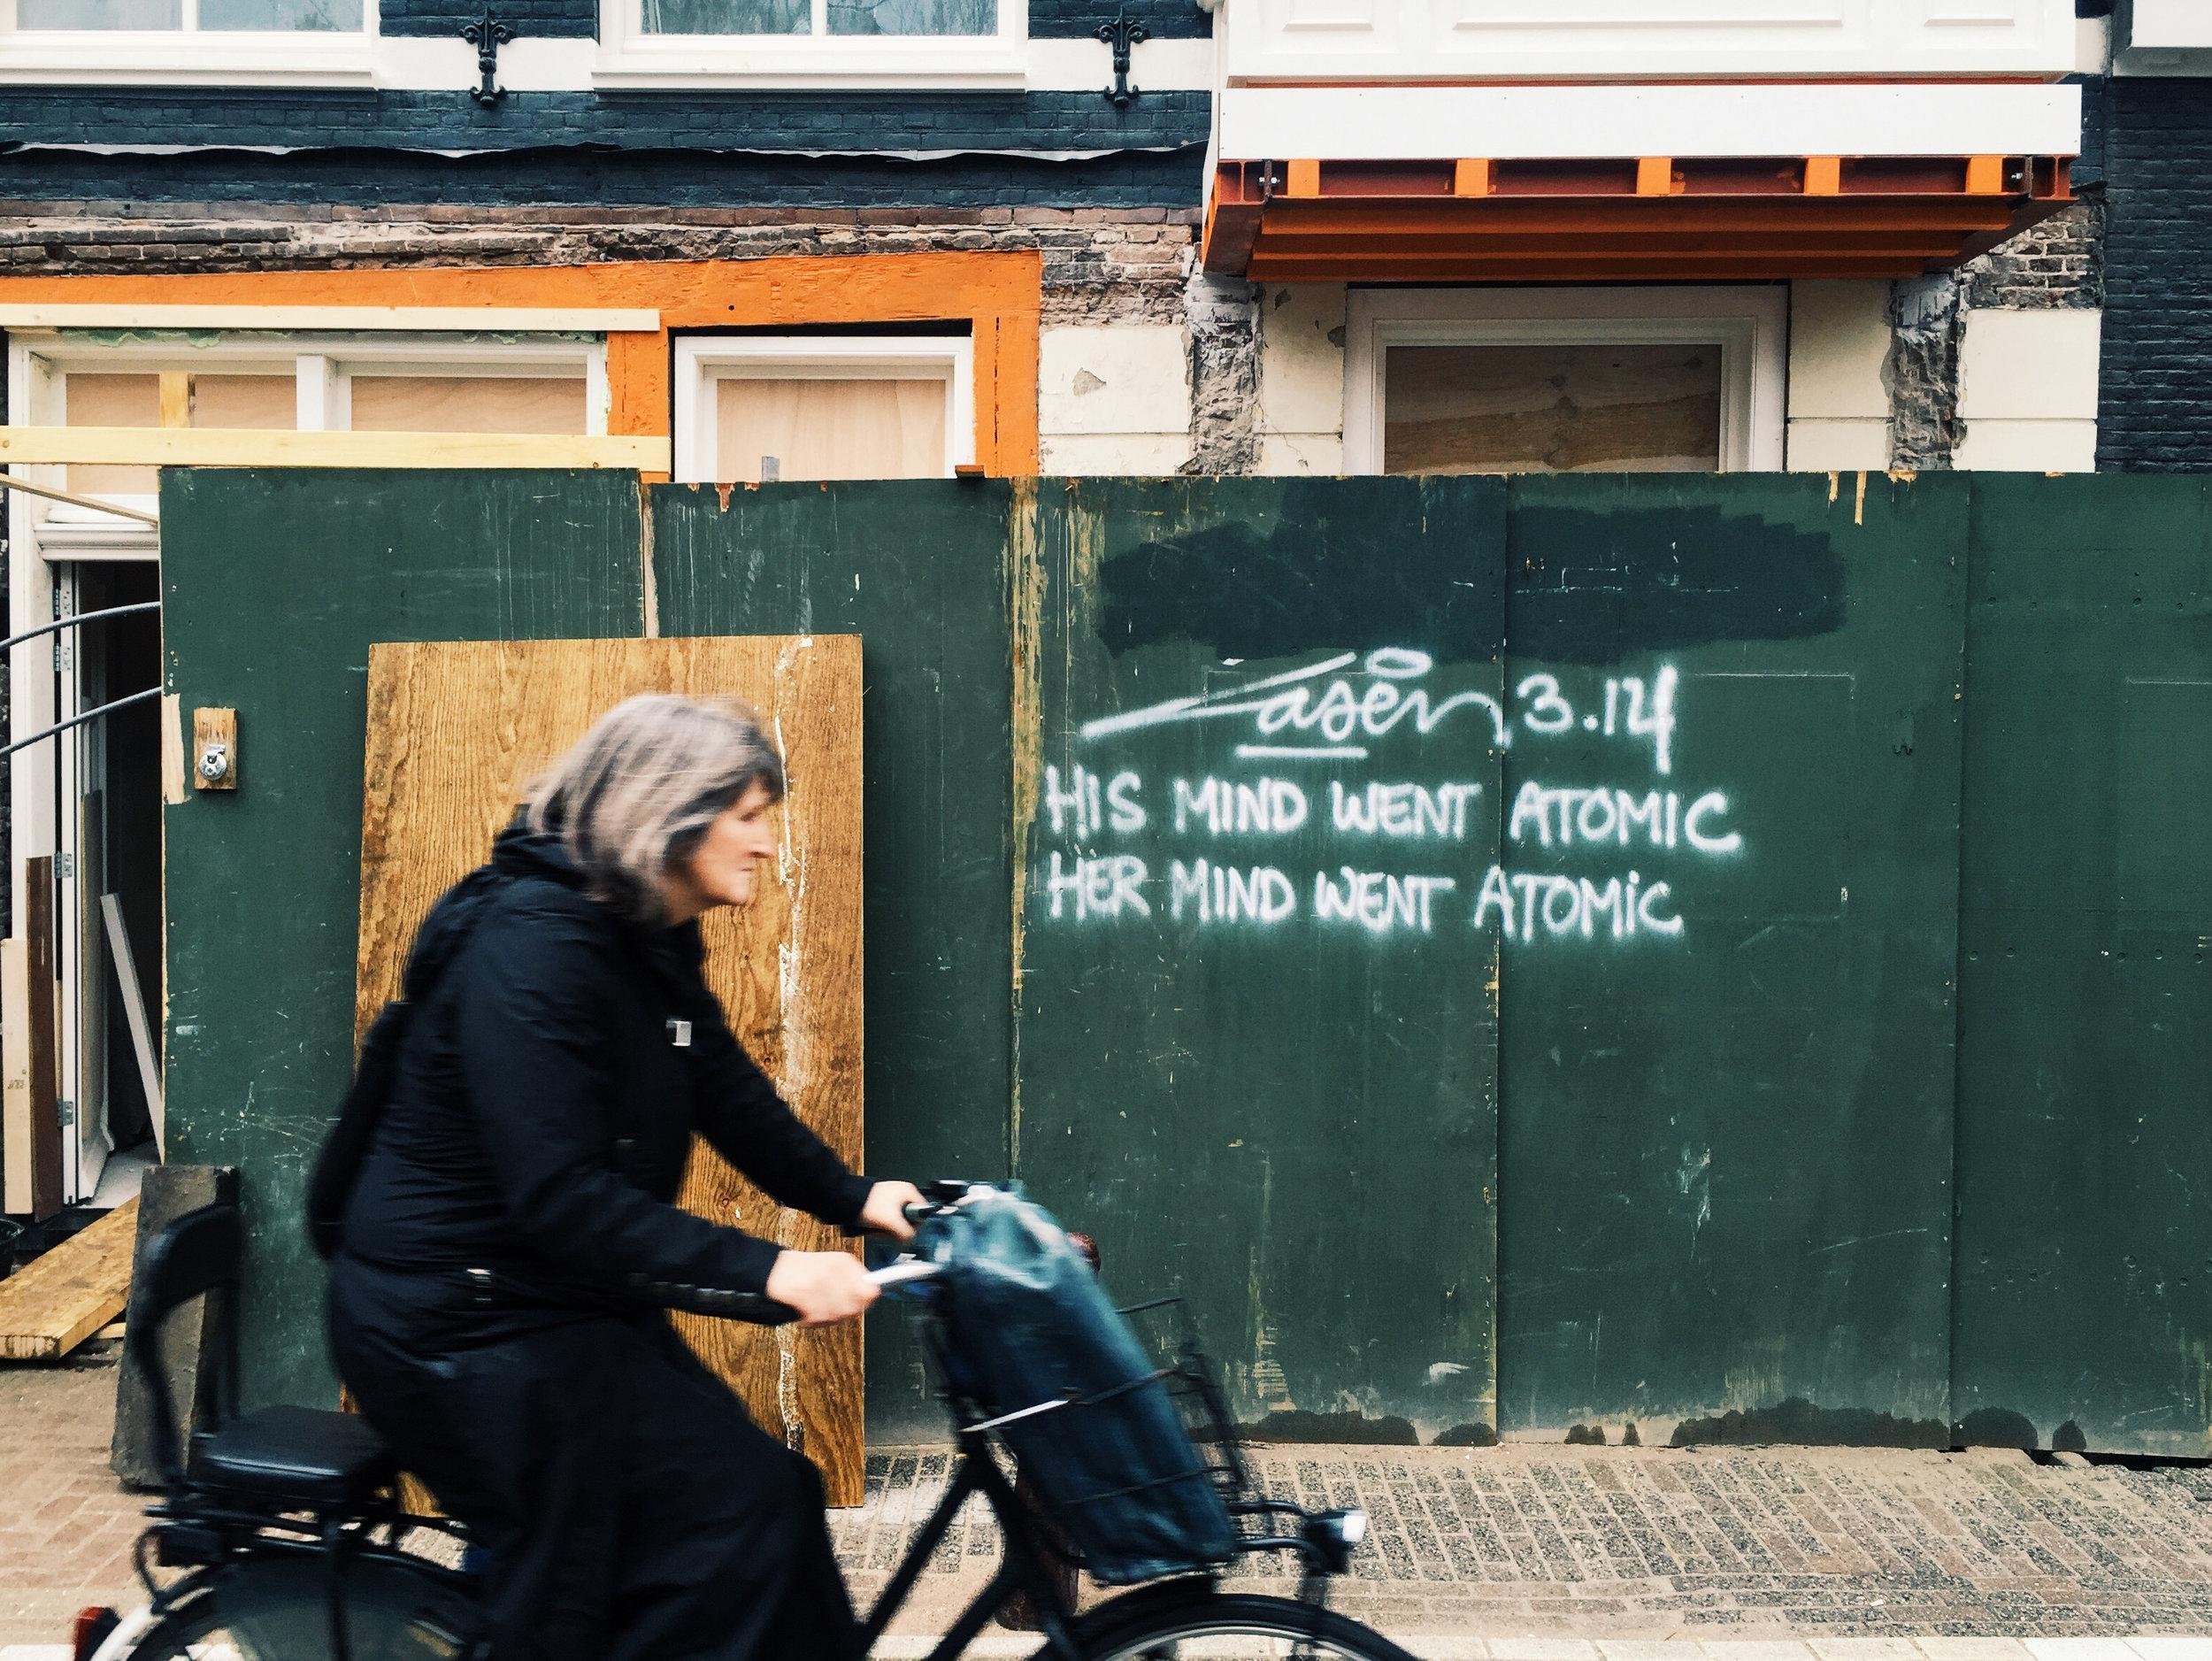 Laser314_StreetShot_HisMindWentAtomicHerMindWentAtomic_Amsterdam2016_PhotographerLaser314_3X4.jpg